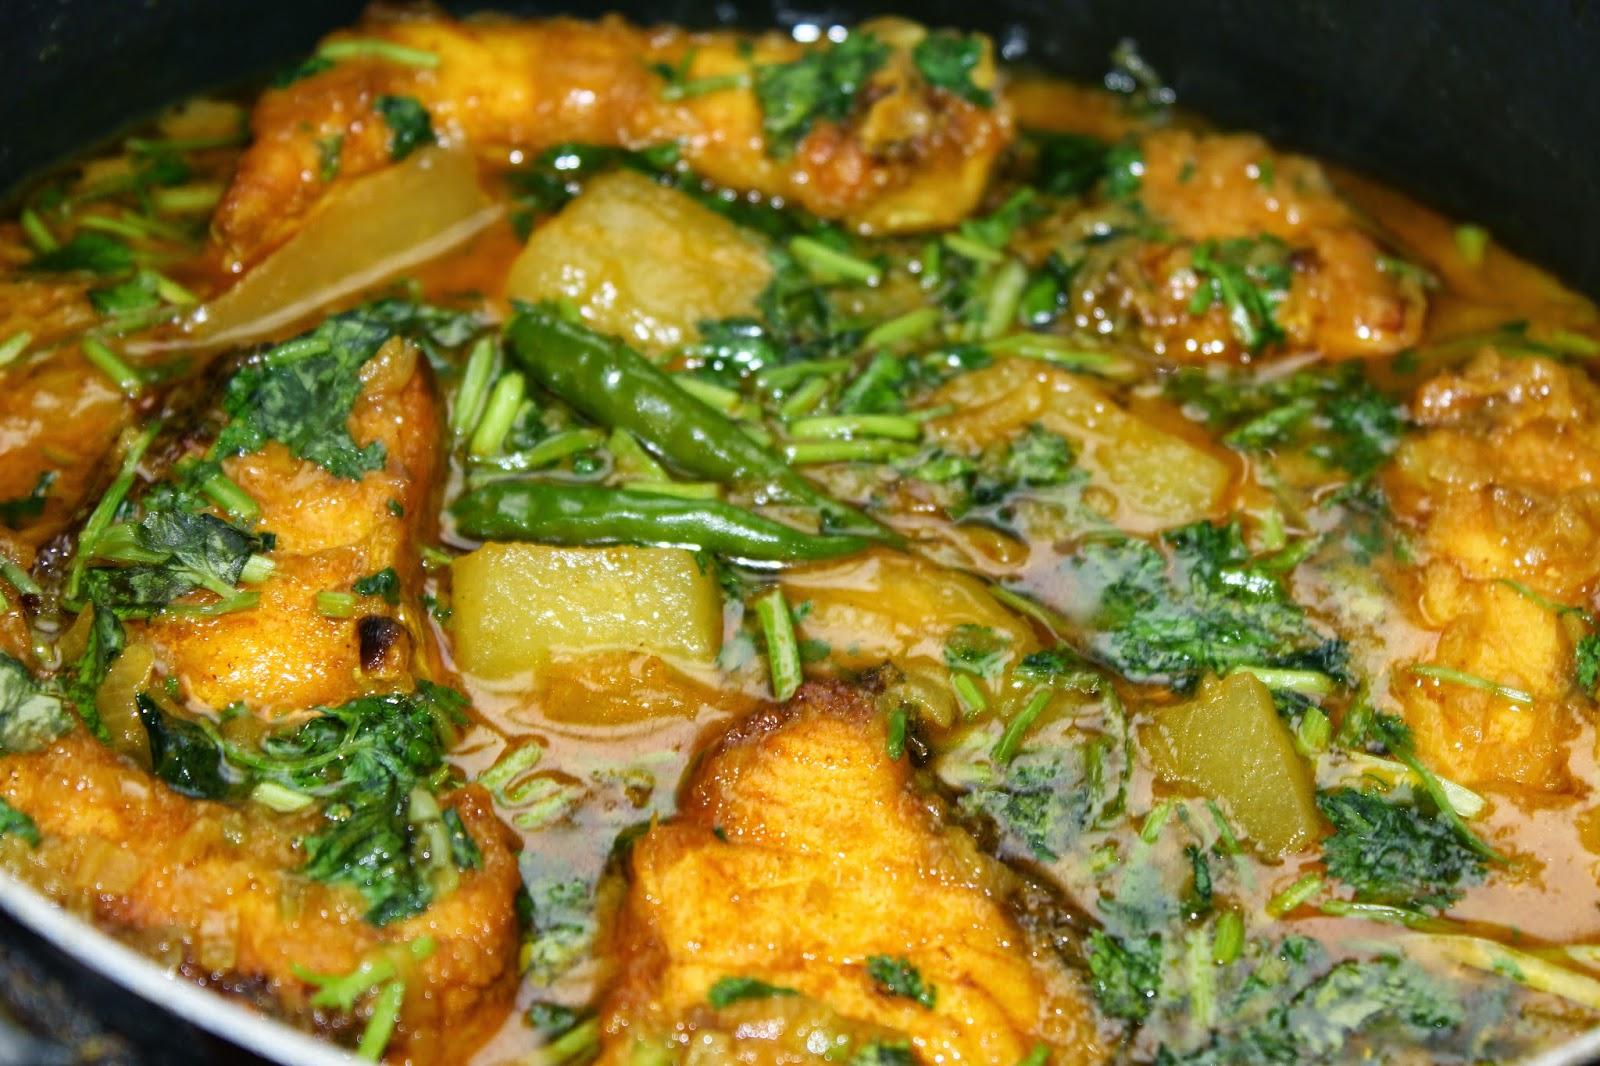 Bengali Recipe: Fish With Green Papaya Curry